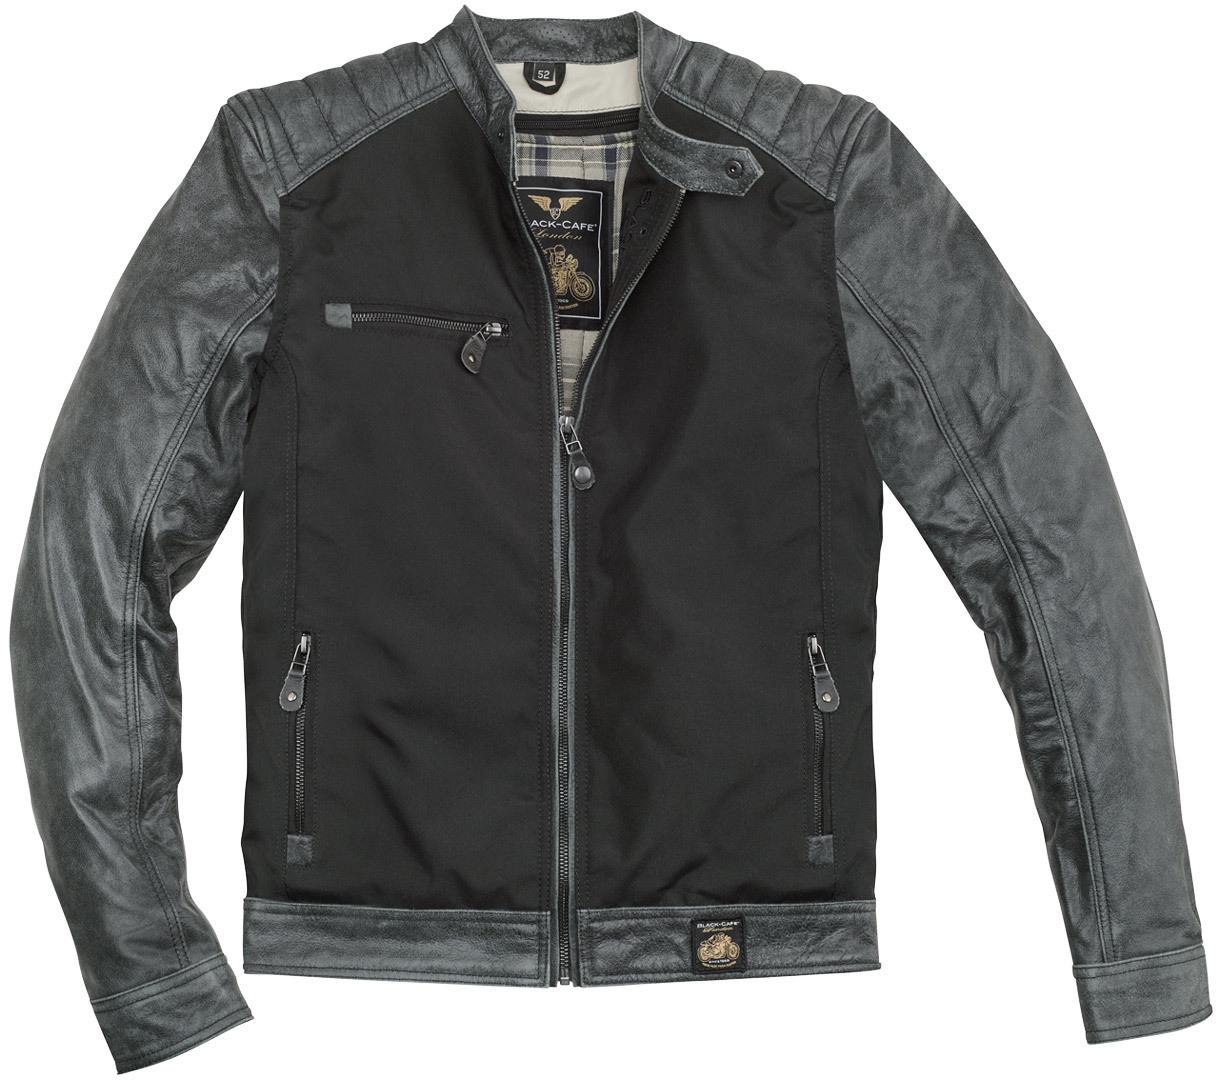 Black-Cafe London Johannesburg Motorrad Leder- / Textiljacke, schwarz-grau, Größe 54, schwarz-grau, Größe 54